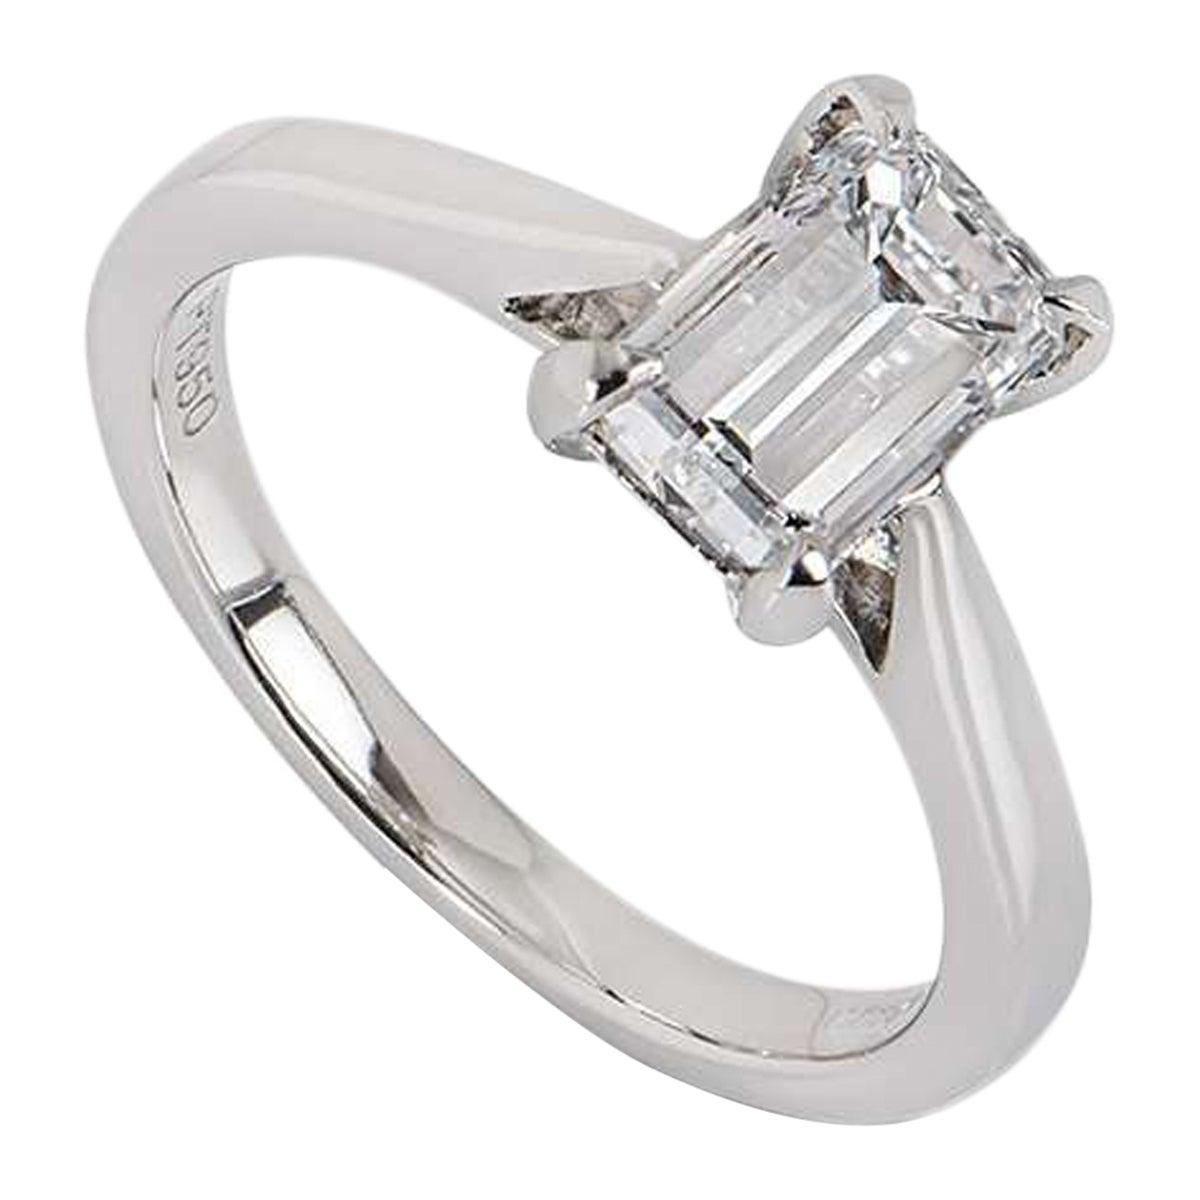 GIA Certified Platinum Emerald Cut Diamond Ring 1.50 Carat E/VVS2